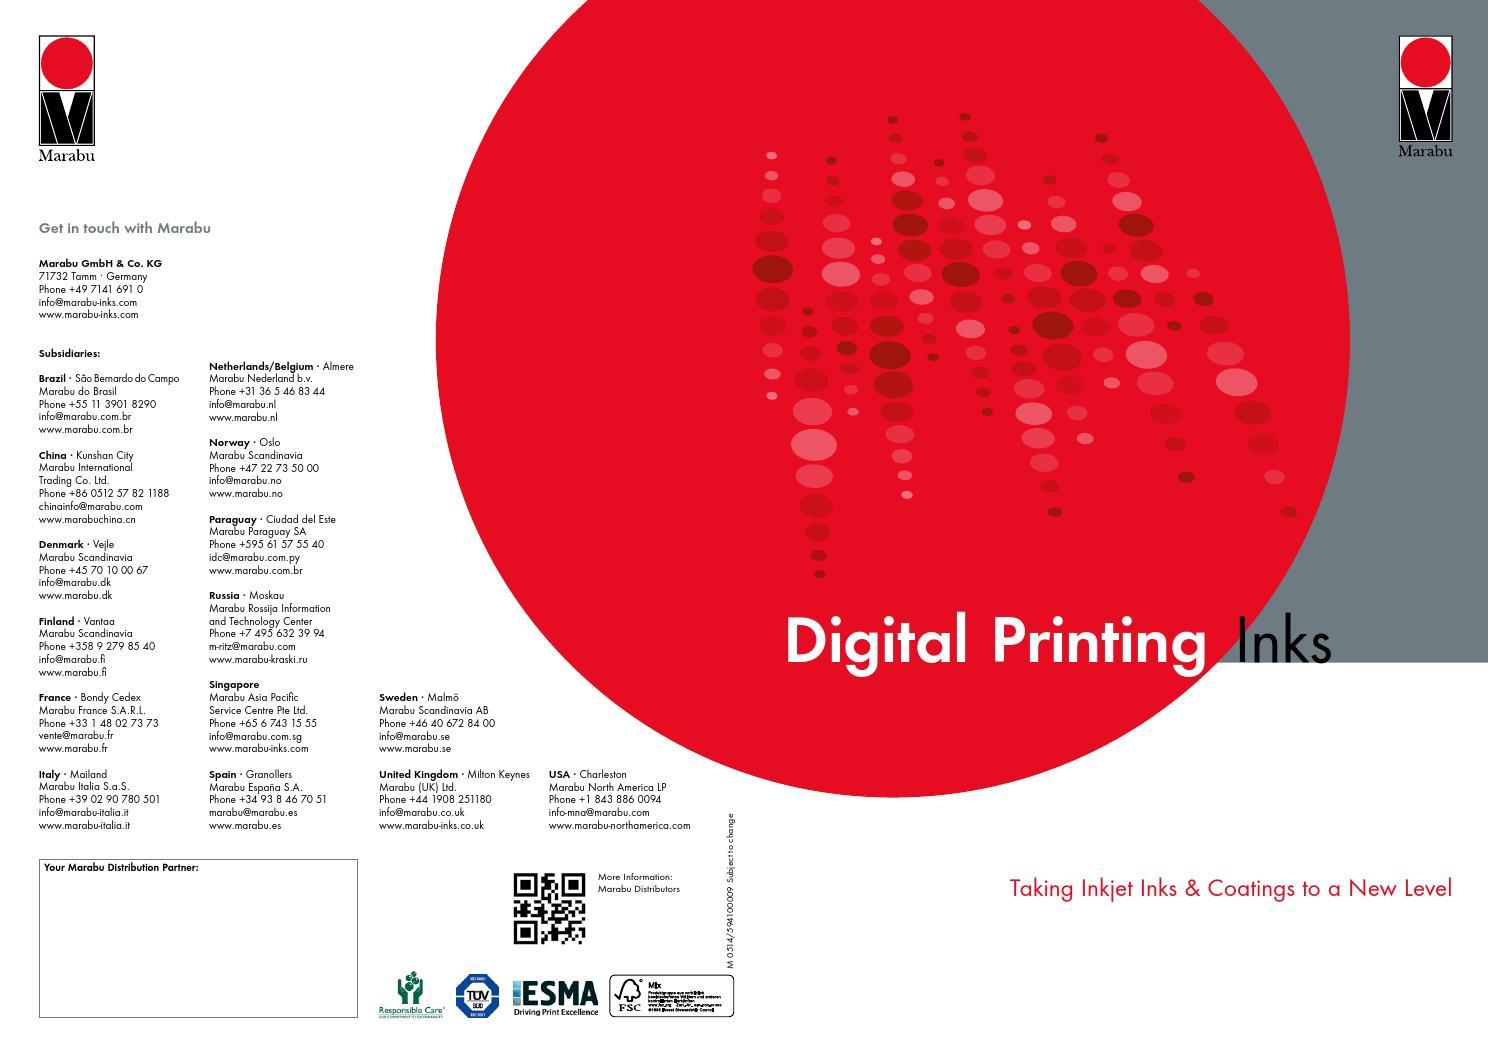 brochure digital printing inks by marabu gmbh co kg issuu. Black Bedroom Furniture Sets. Home Design Ideas